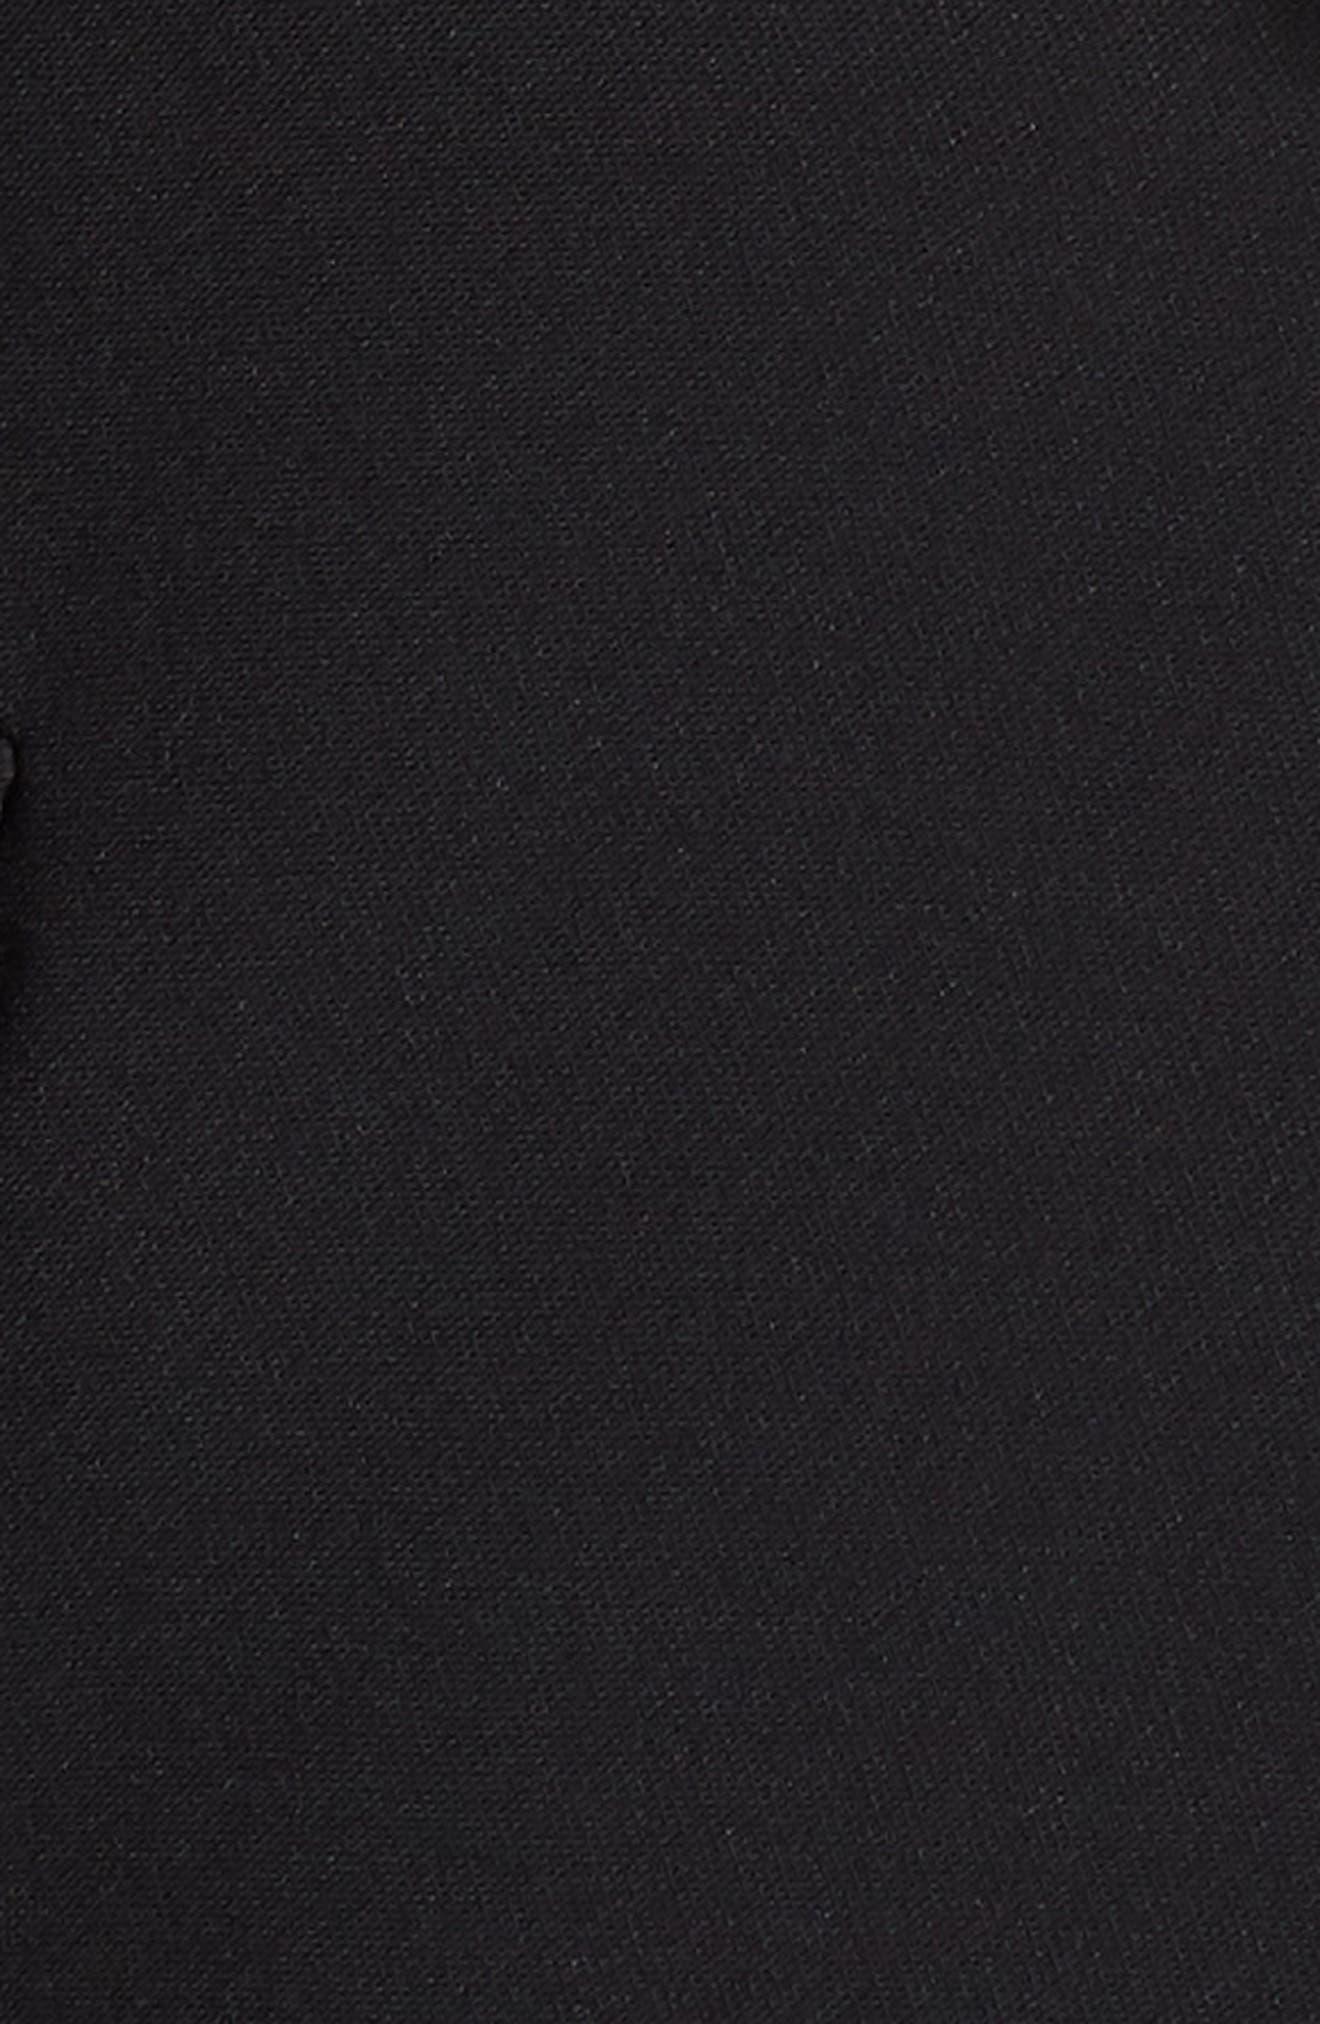 Gathered Sleeve Blazer,                             Alternate thumbnail 4, color,                             BLACK